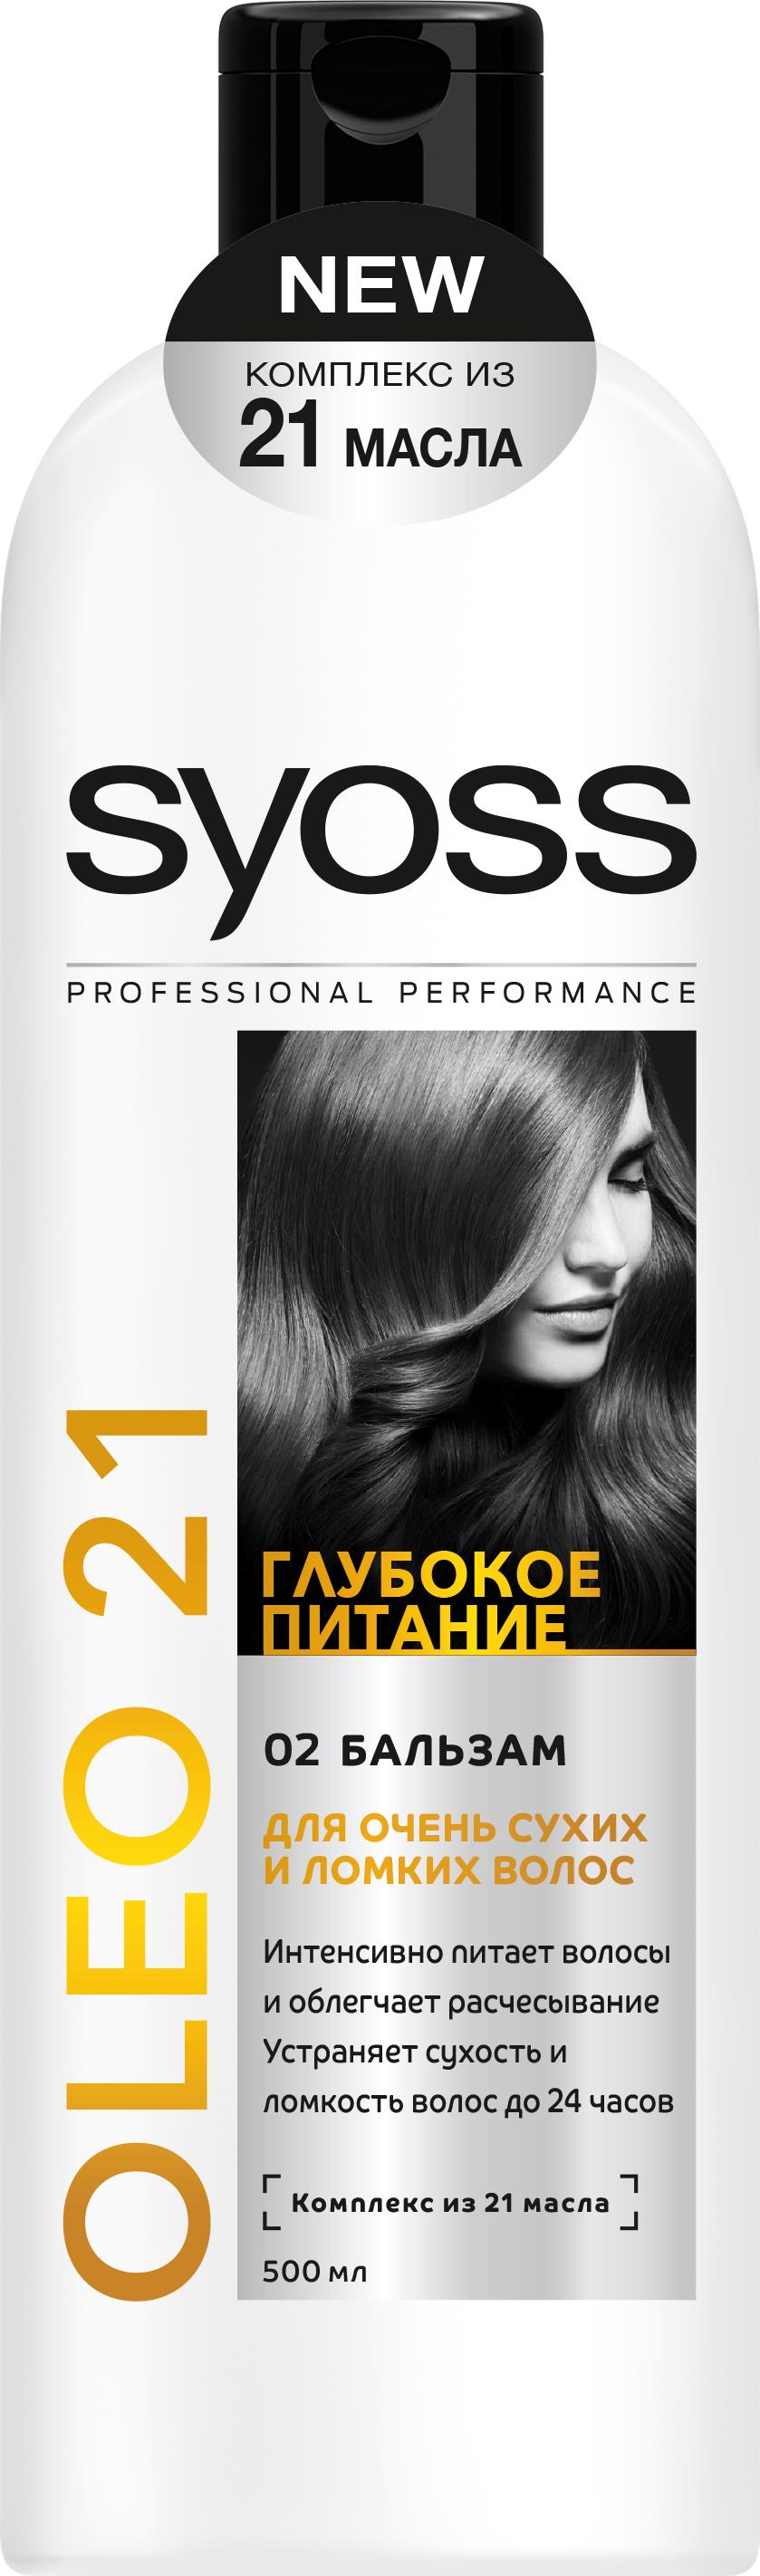 Syoss Бальзам Oleo Intense Thermo Care, для сухих и ломких волос, 500 мл syoss бальзам oleo intense thermo care для сухих и ломких волос 500 мл